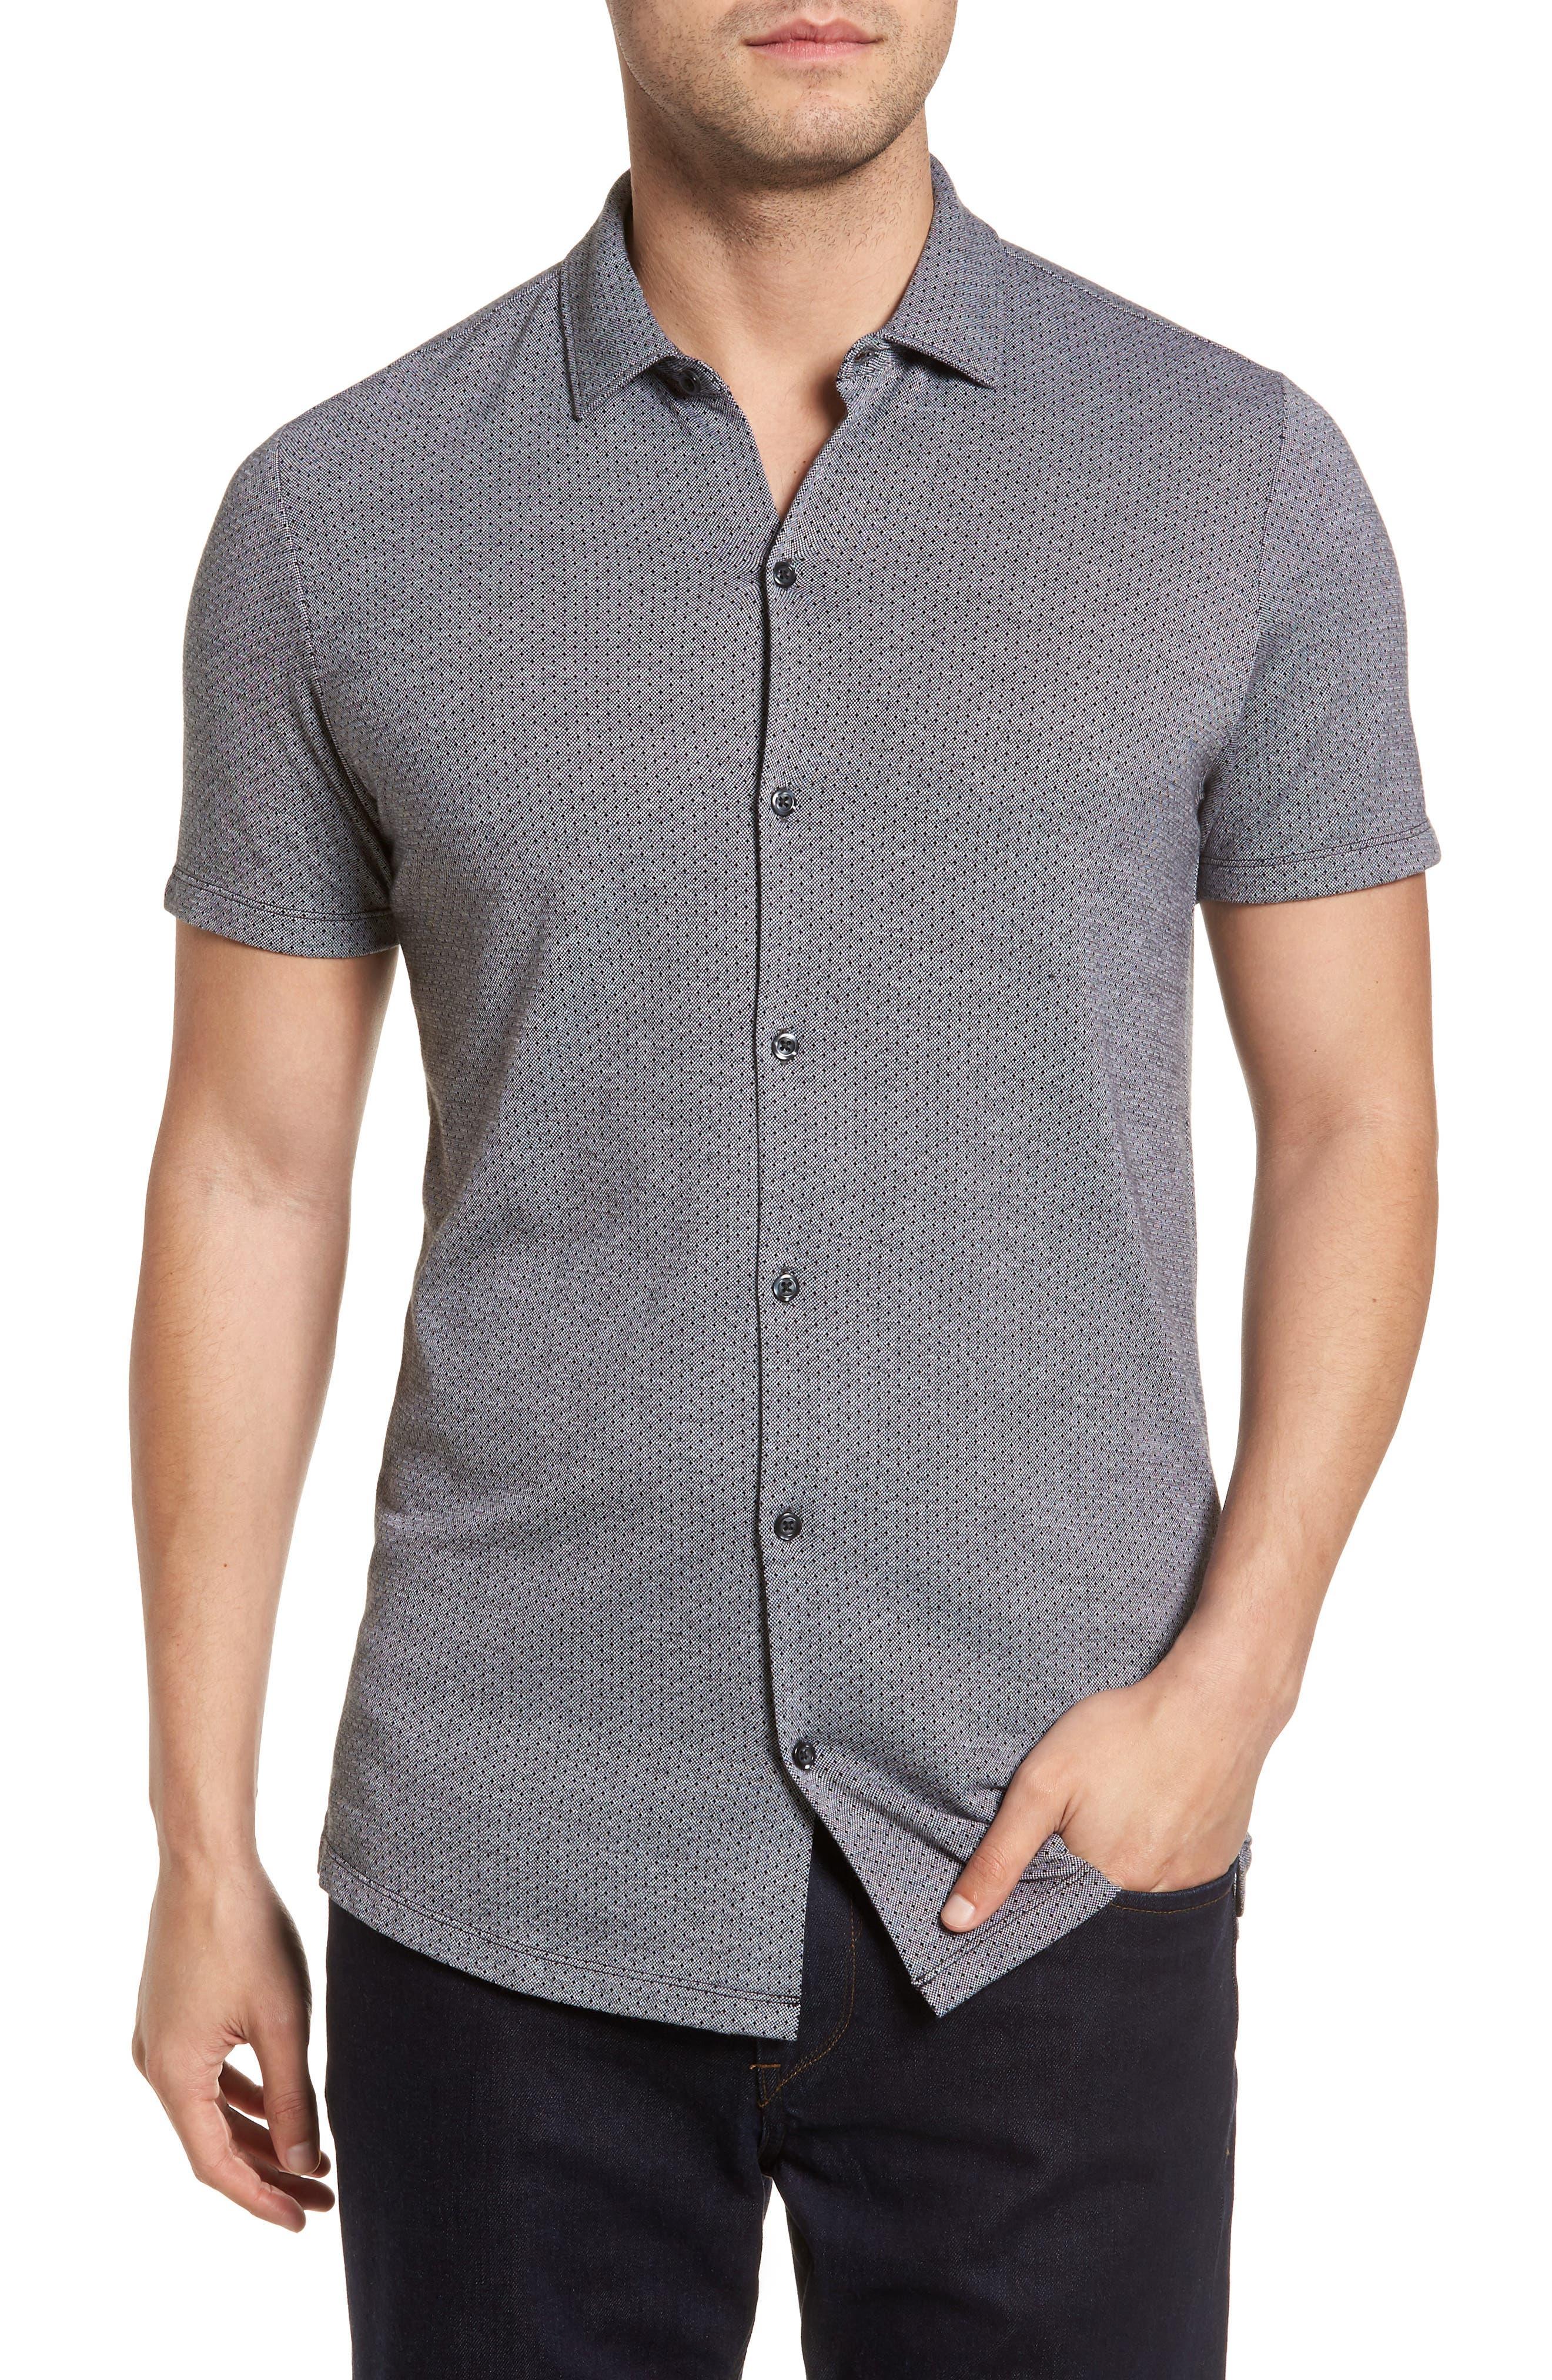 Johnson Sport Shirt,                         Main,                         color, 001